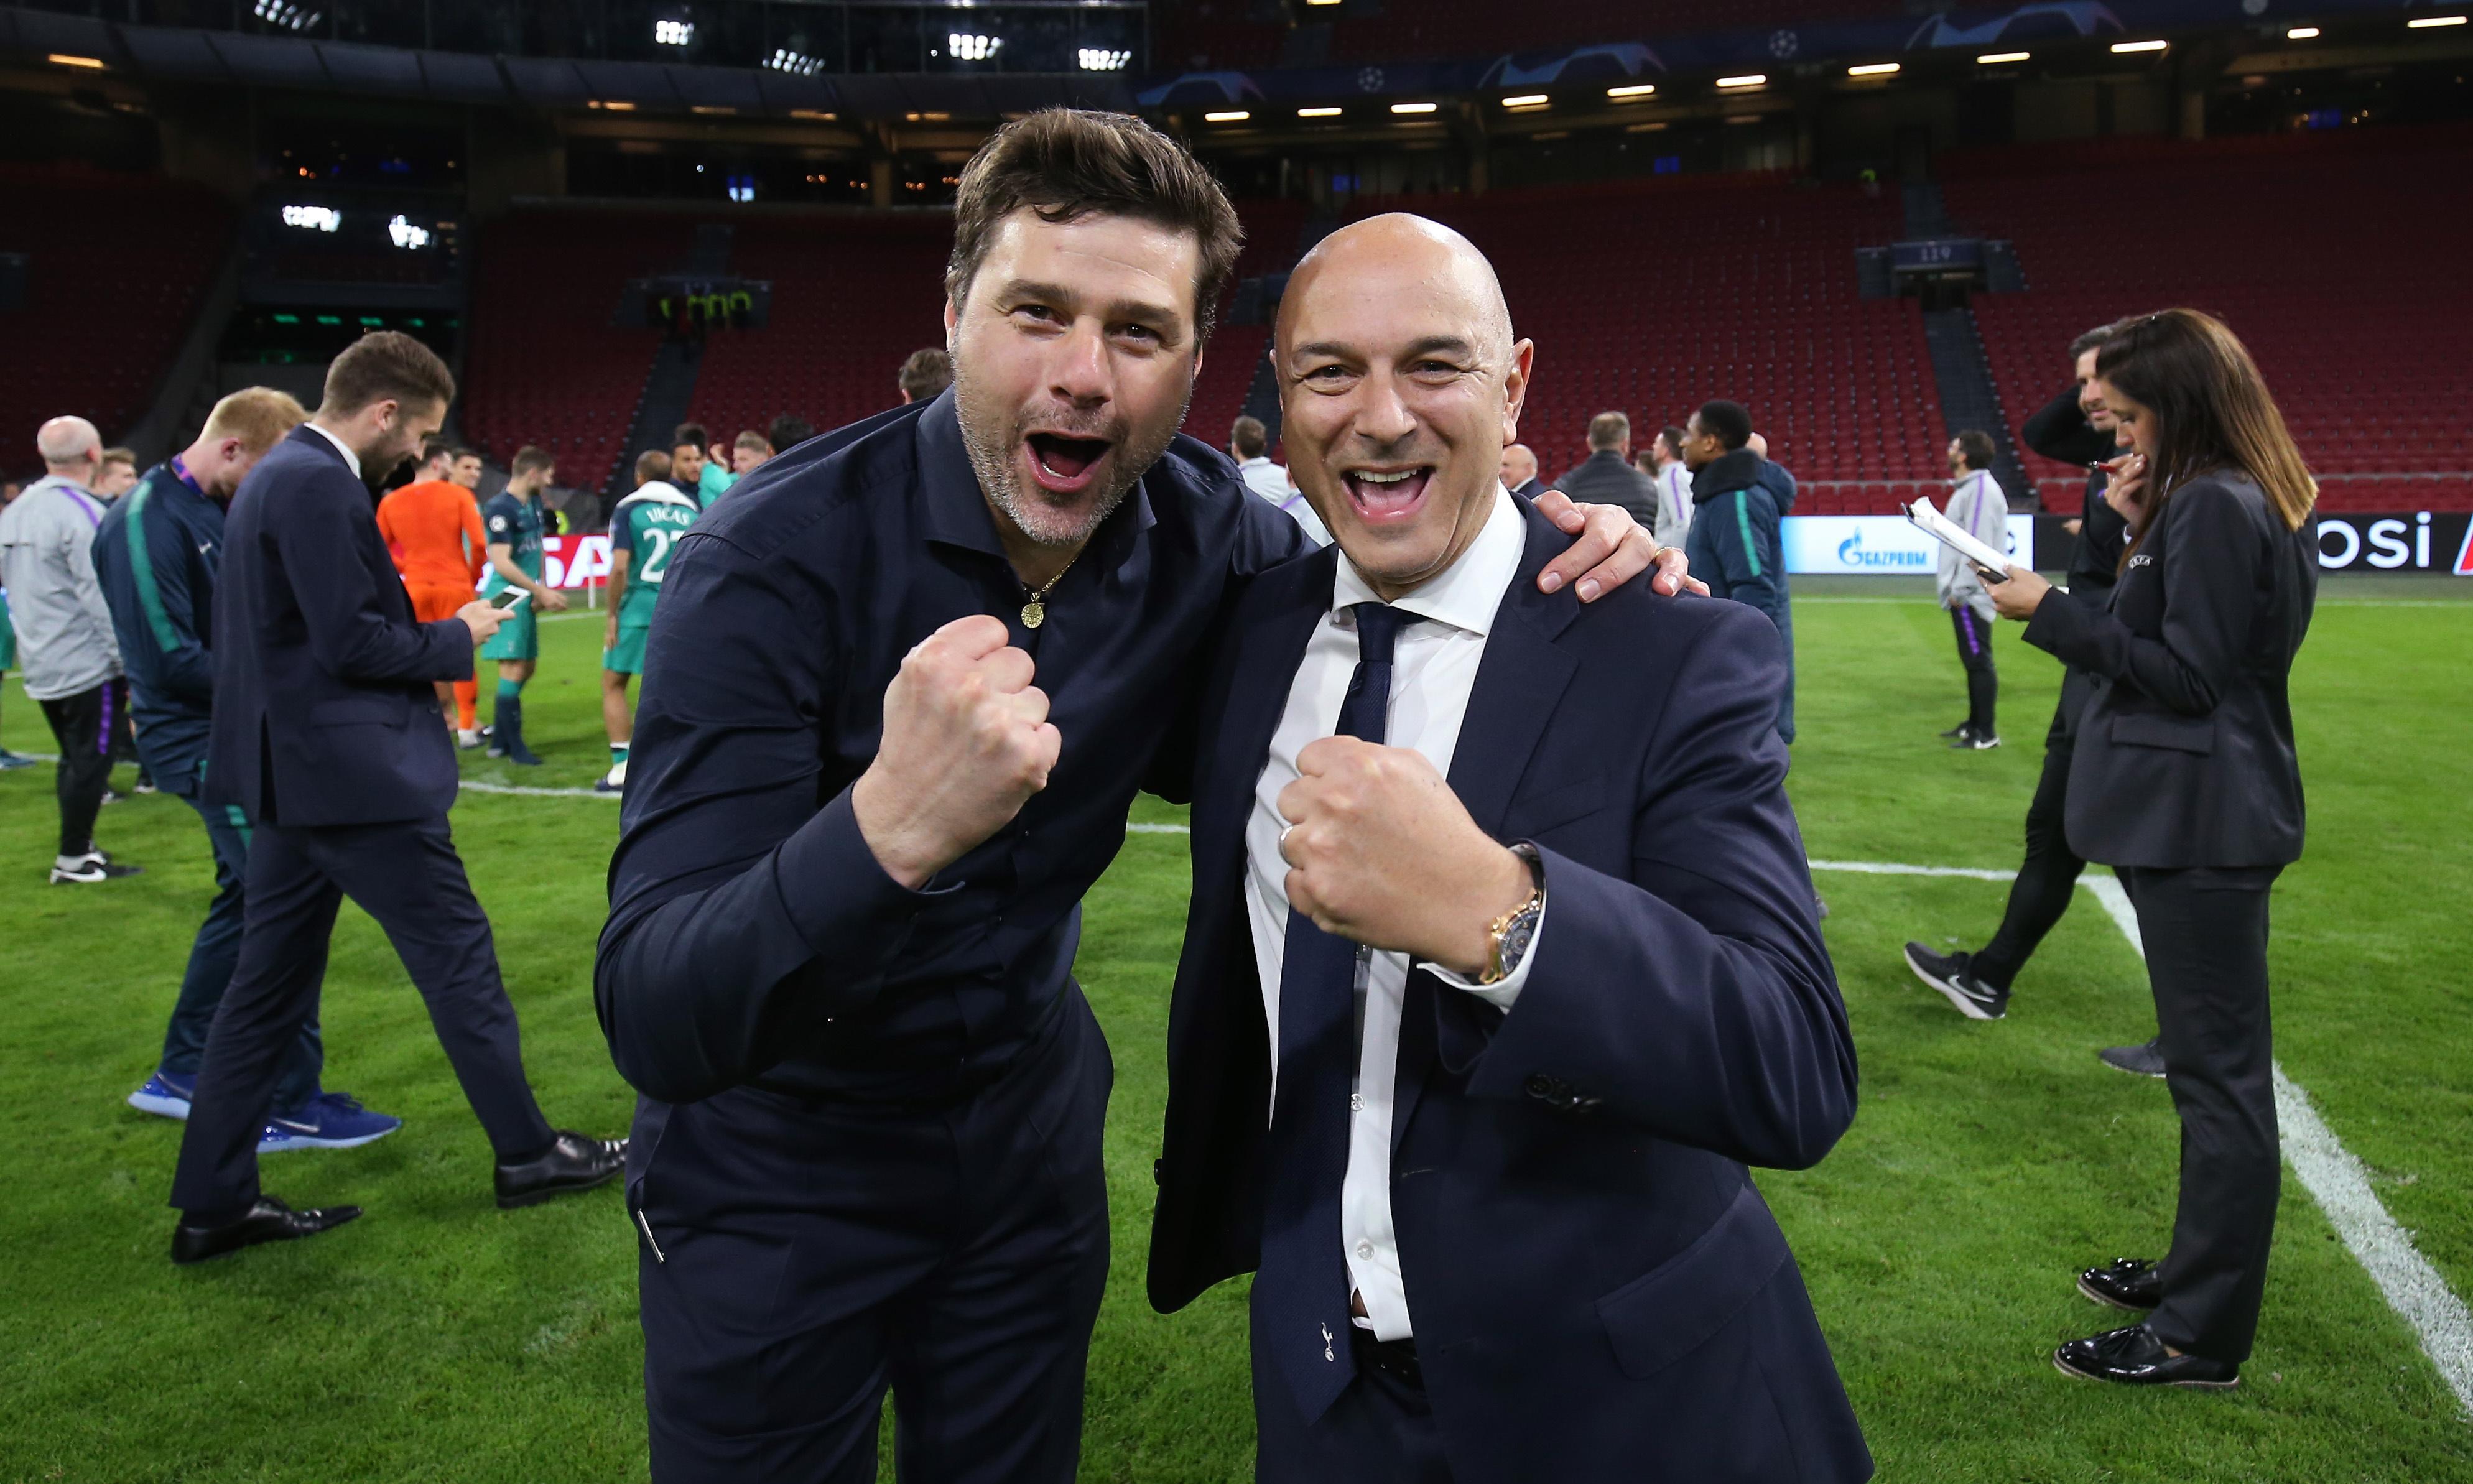 Tottenham close to José Mourinho deal after Mauricio Pochettino sacked